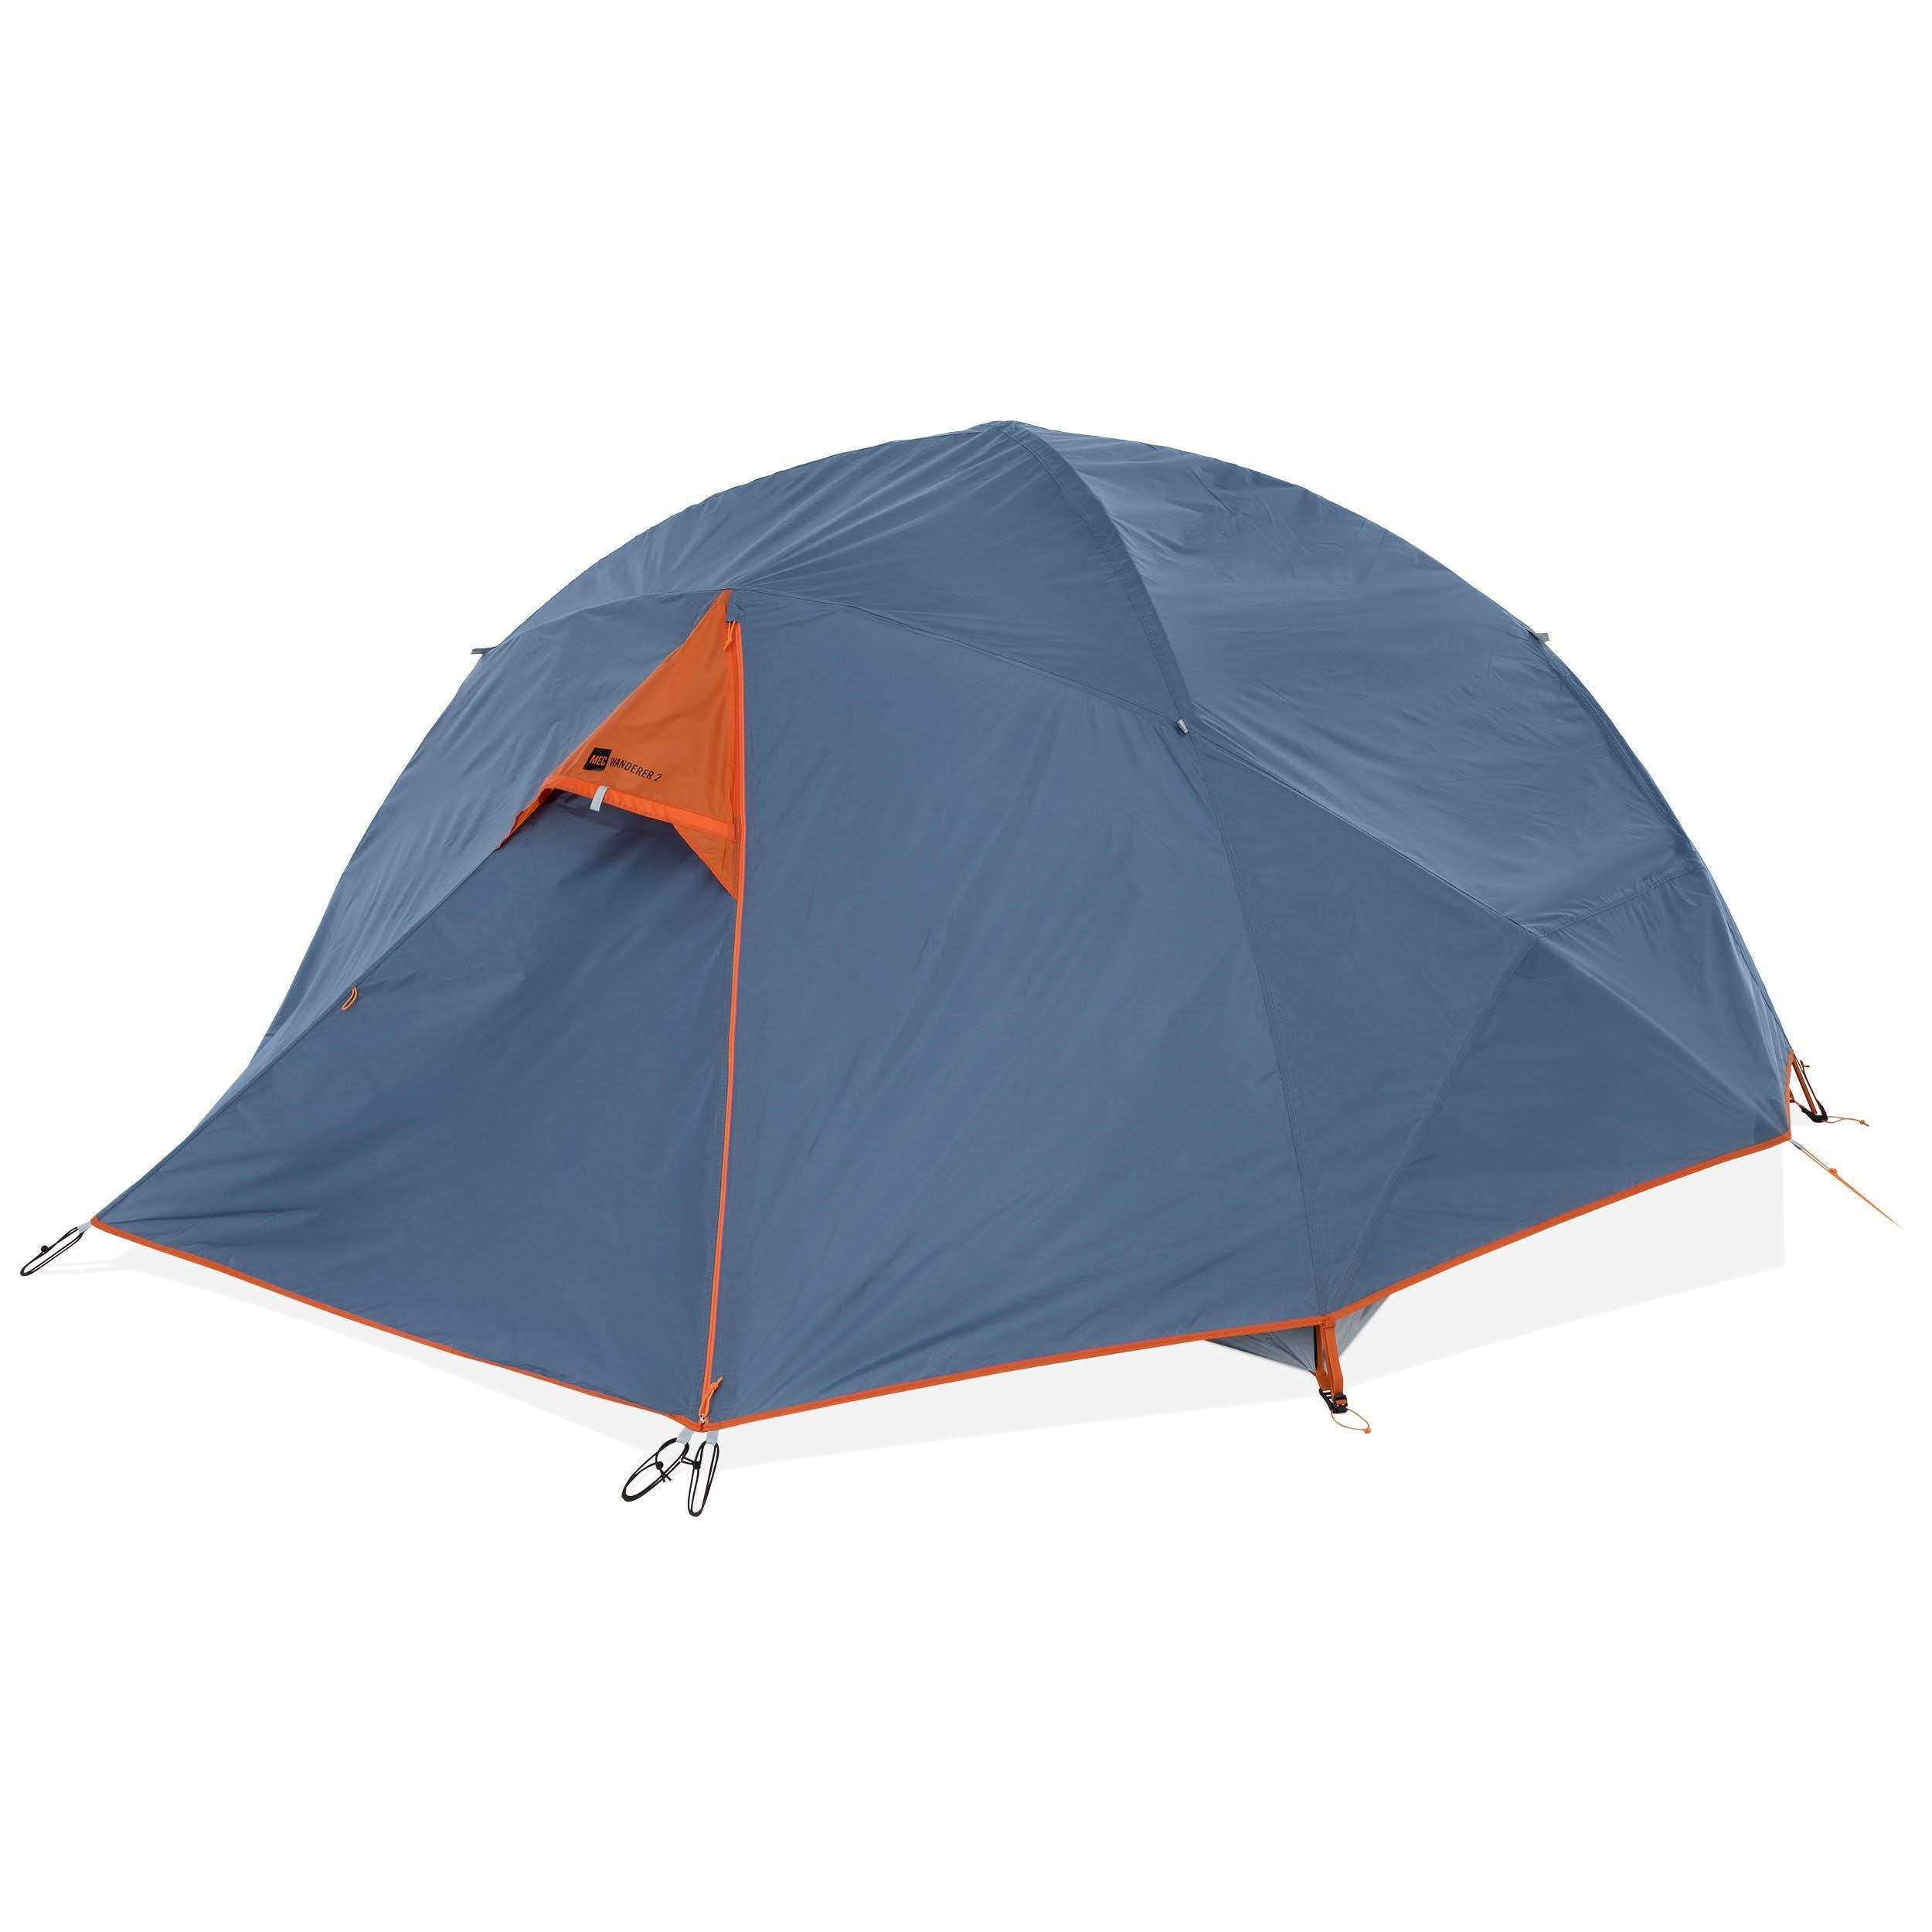 MEC Wanderer 2 Tent